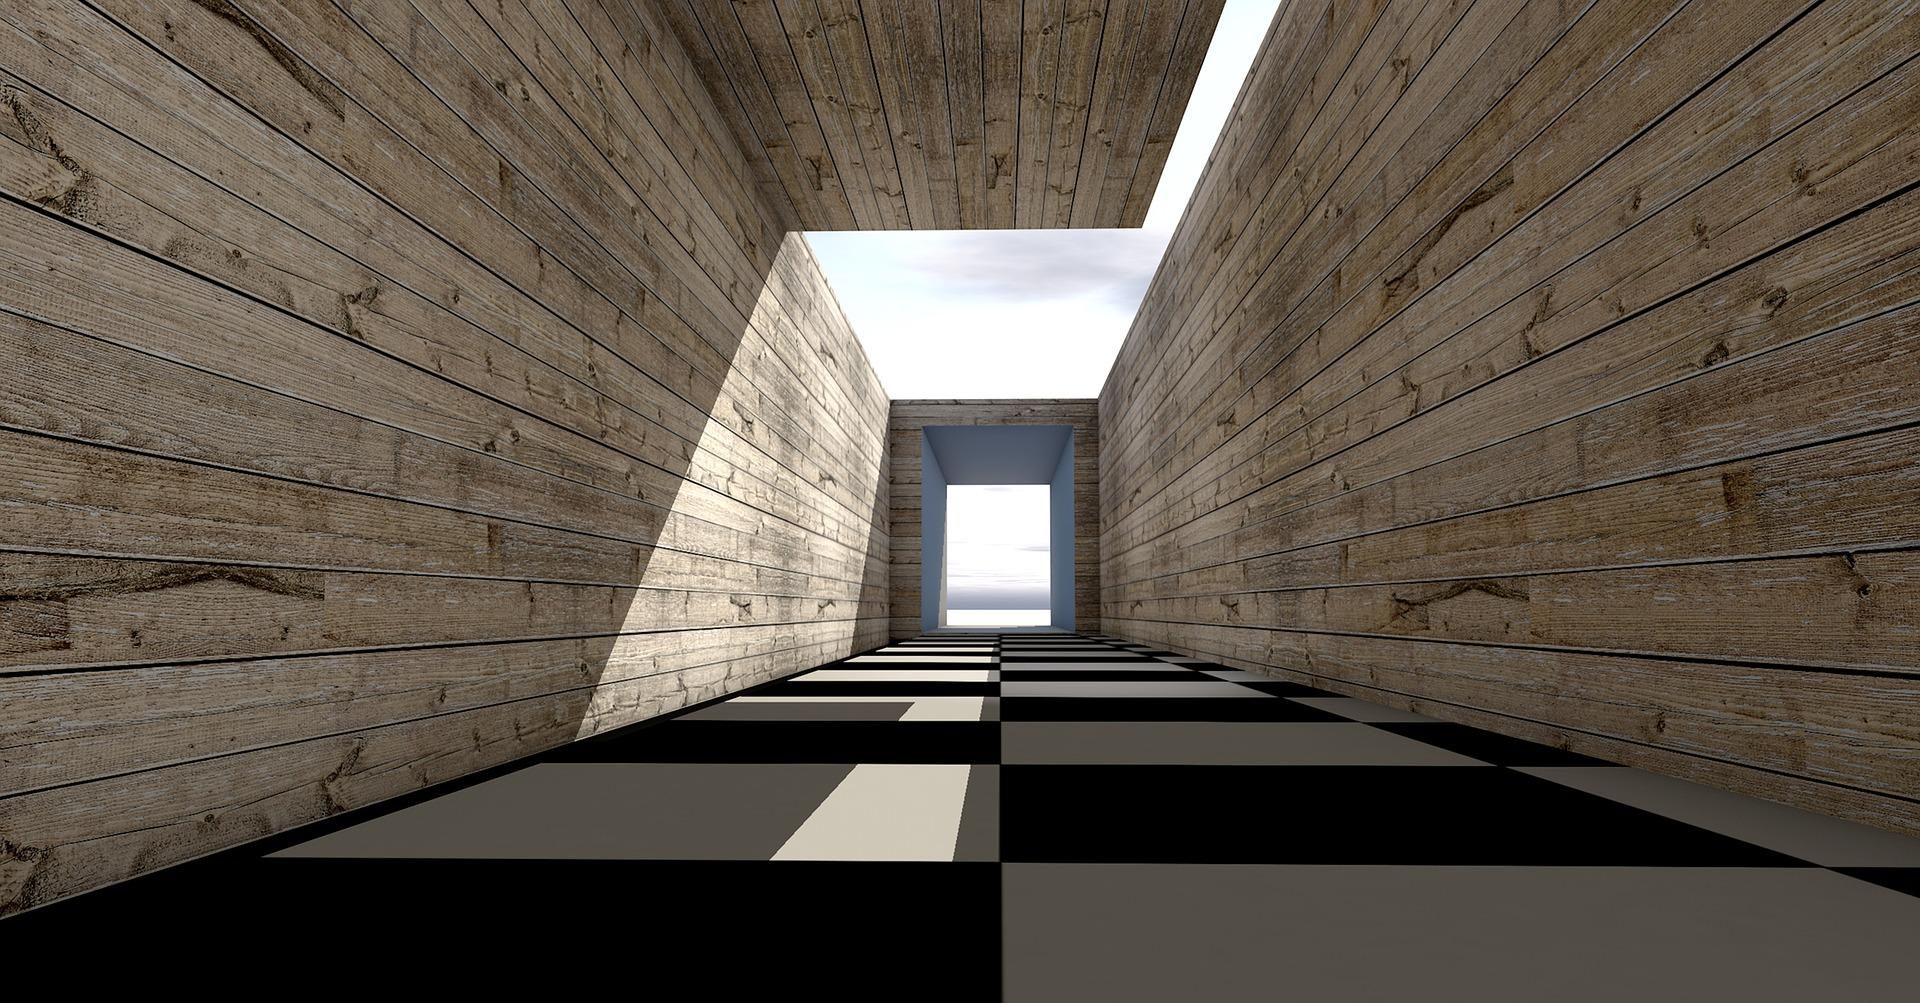 hallway-gb410845f4_c_piro4d_pixabay